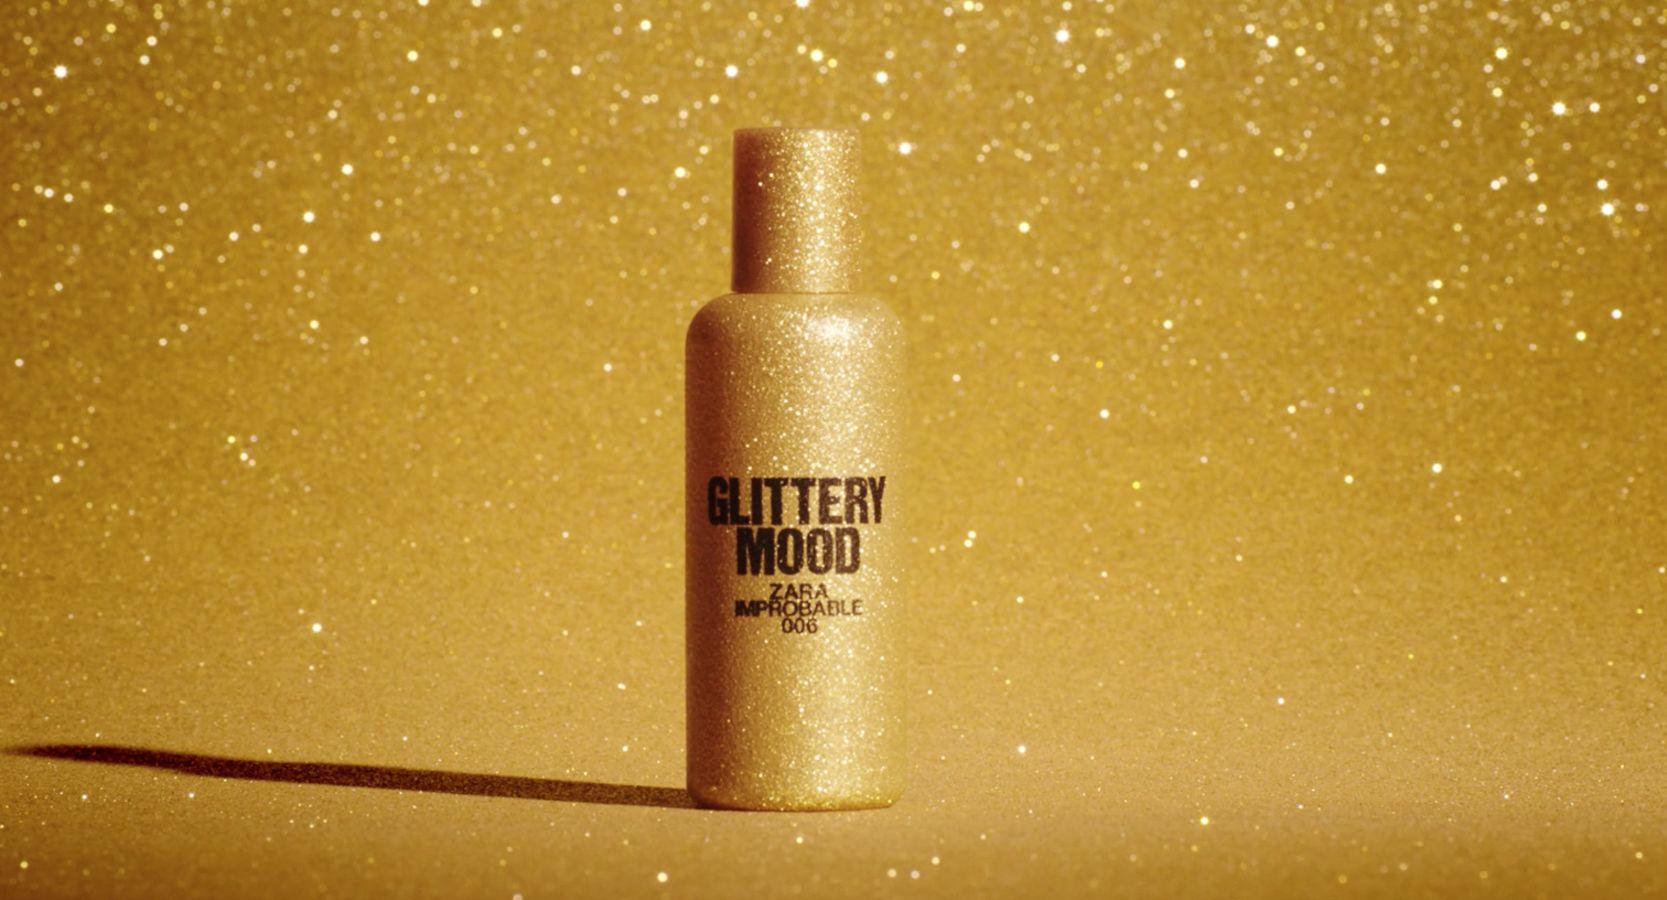 Glittery Mood